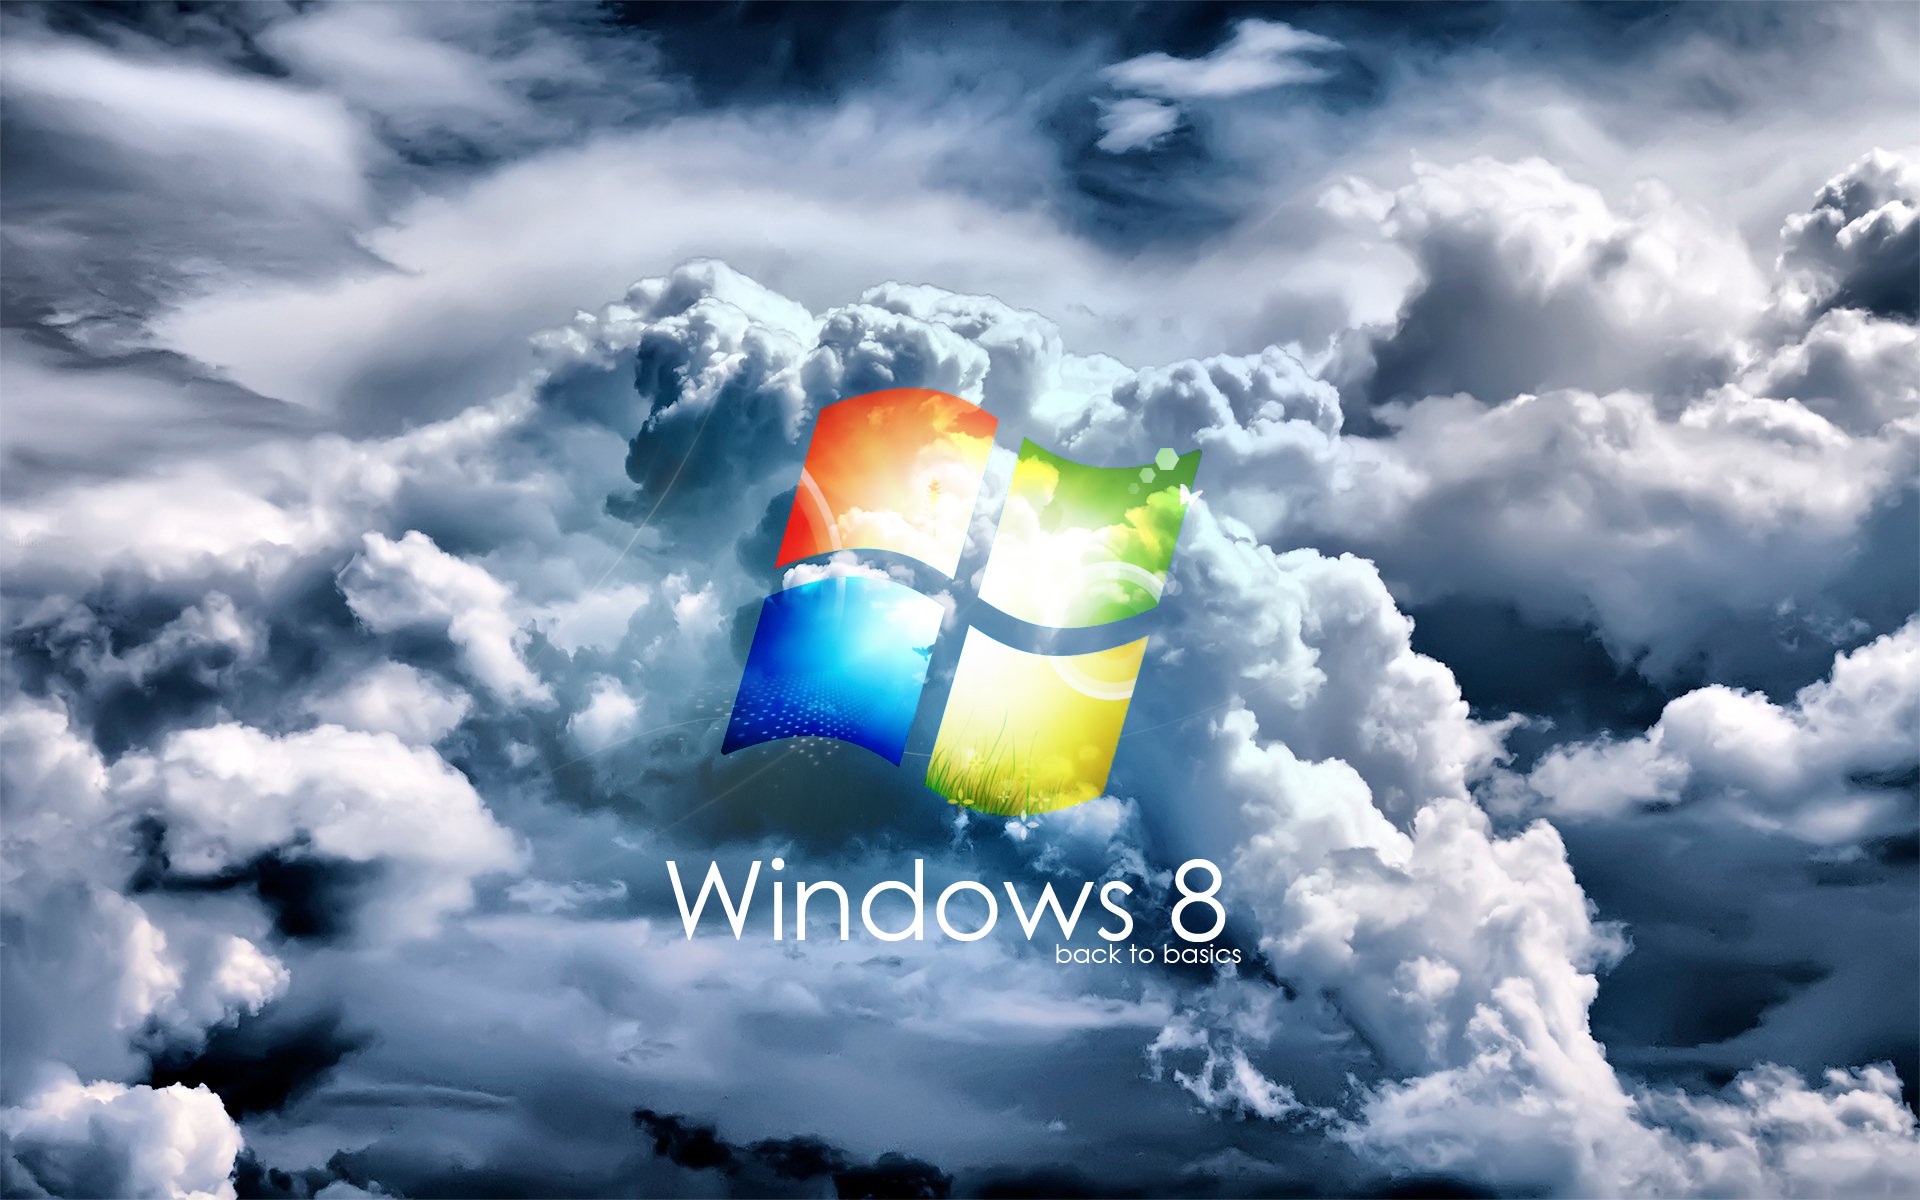 Windows 8 Clouds